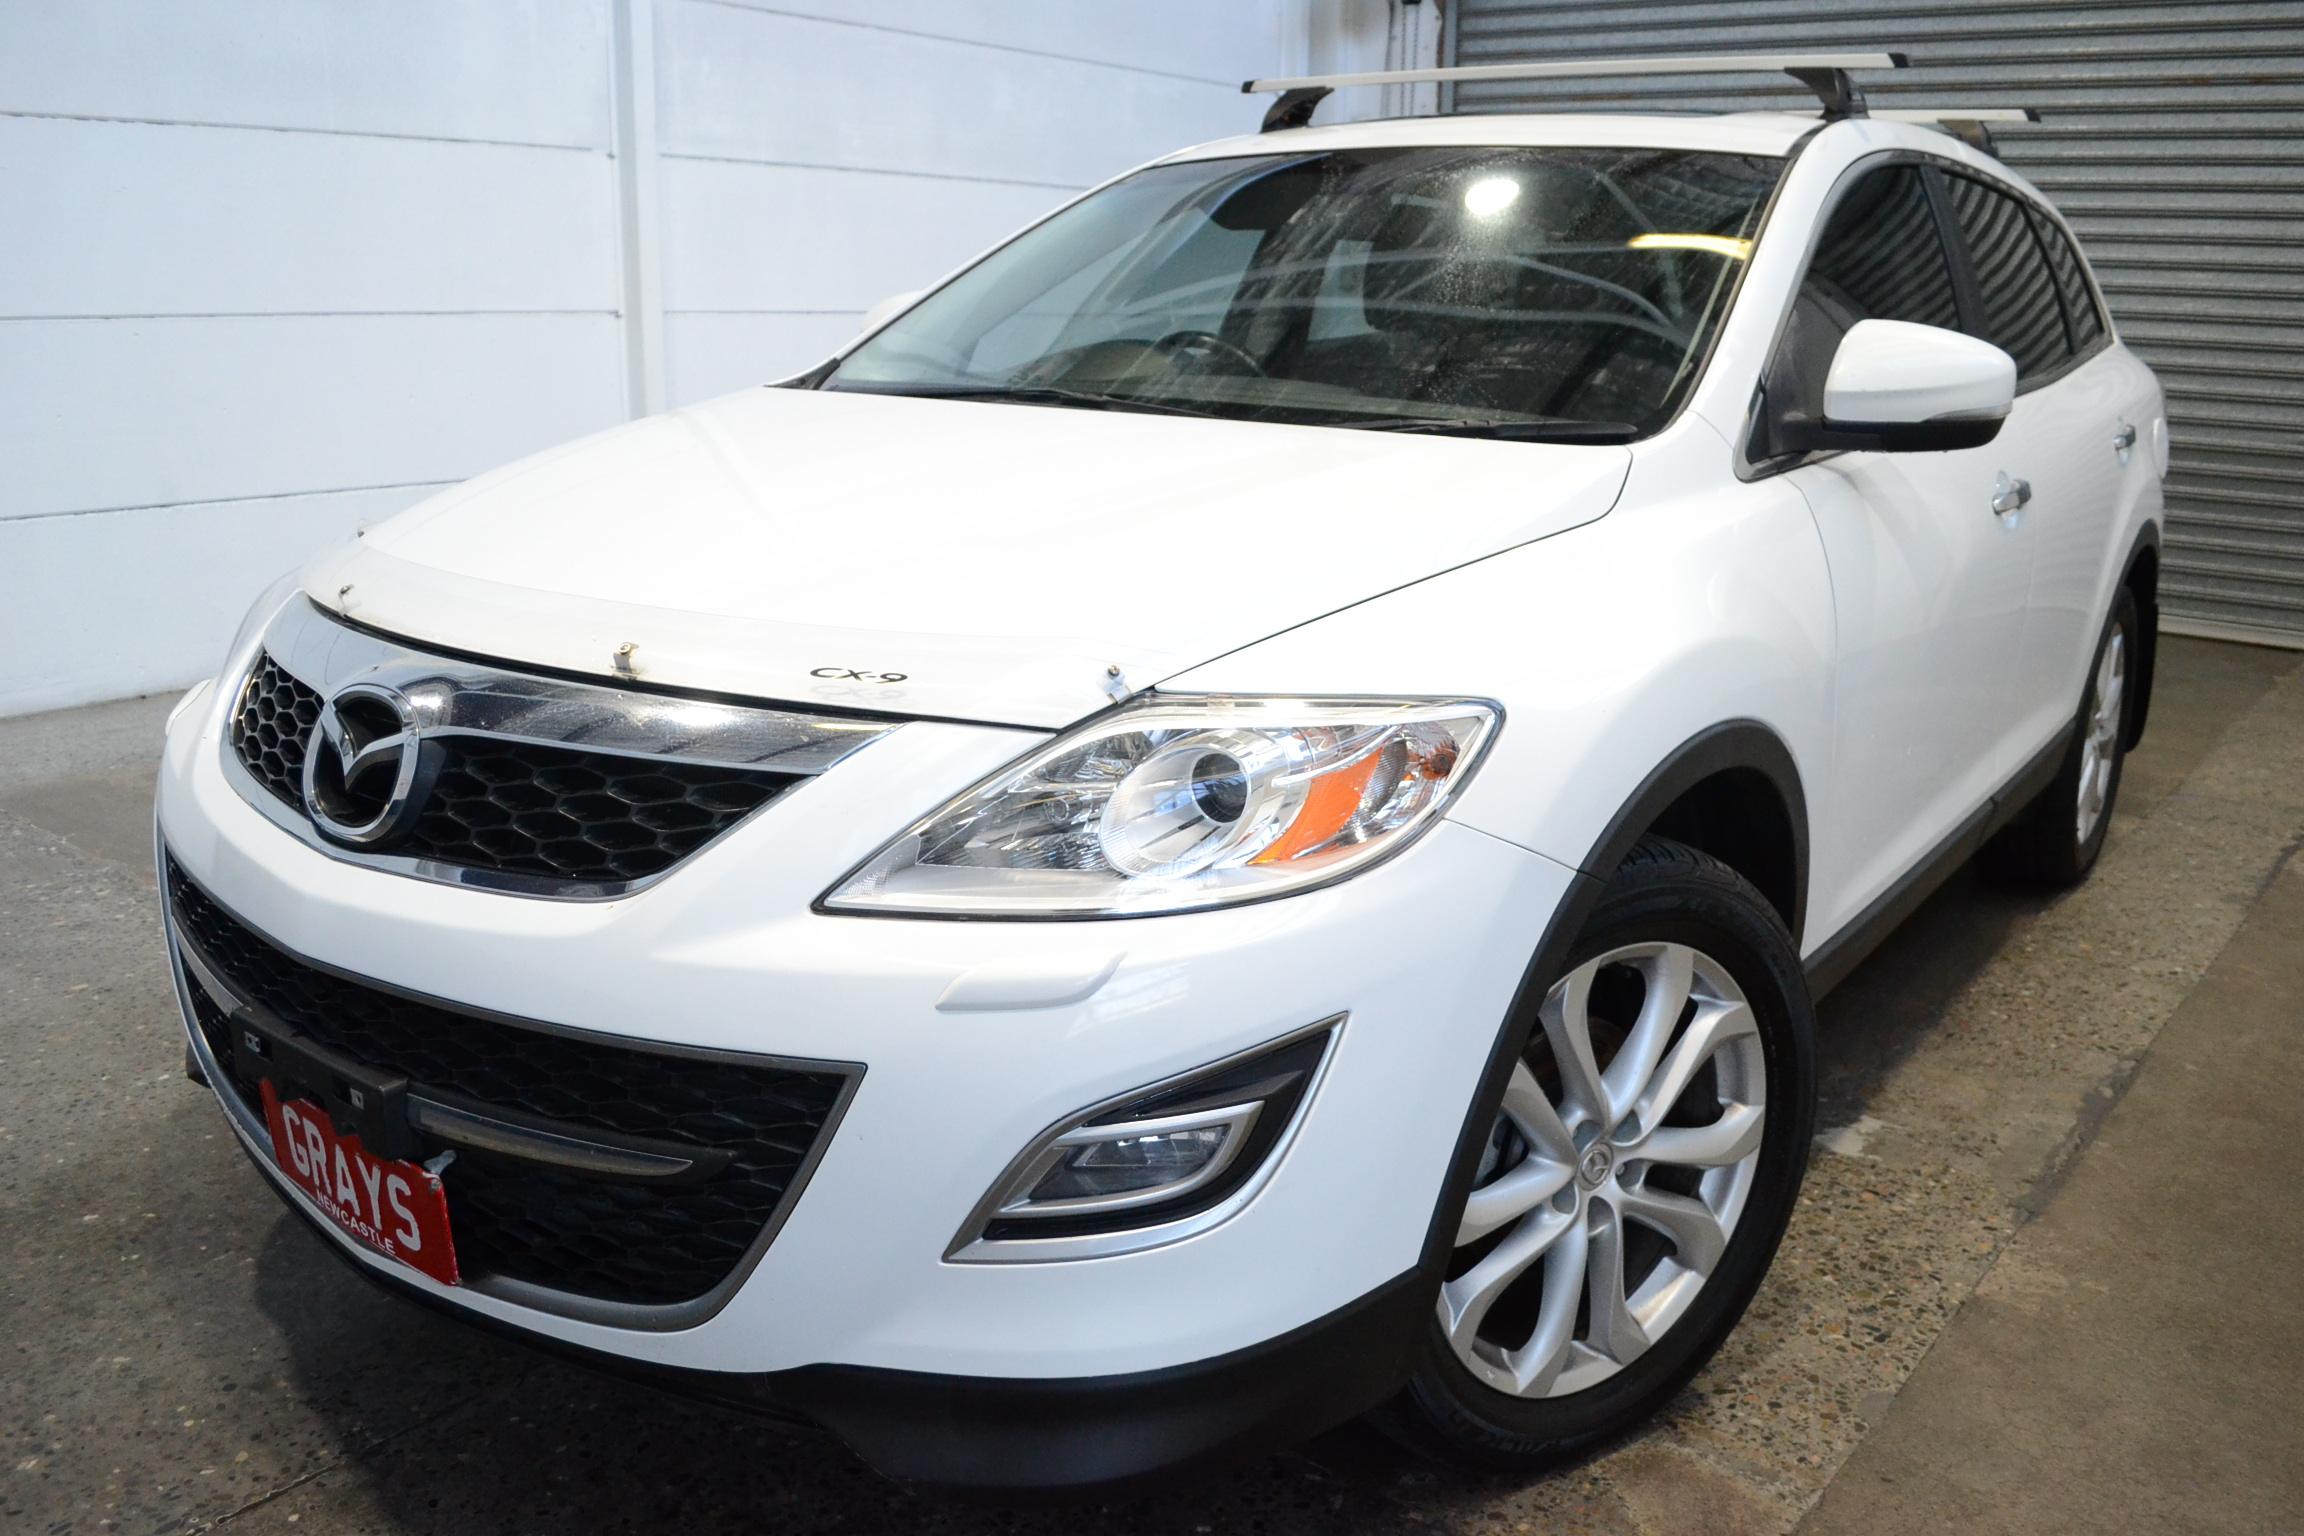 2012 Mazda CX-9 Luxury Automatic 7 Seats Wagon